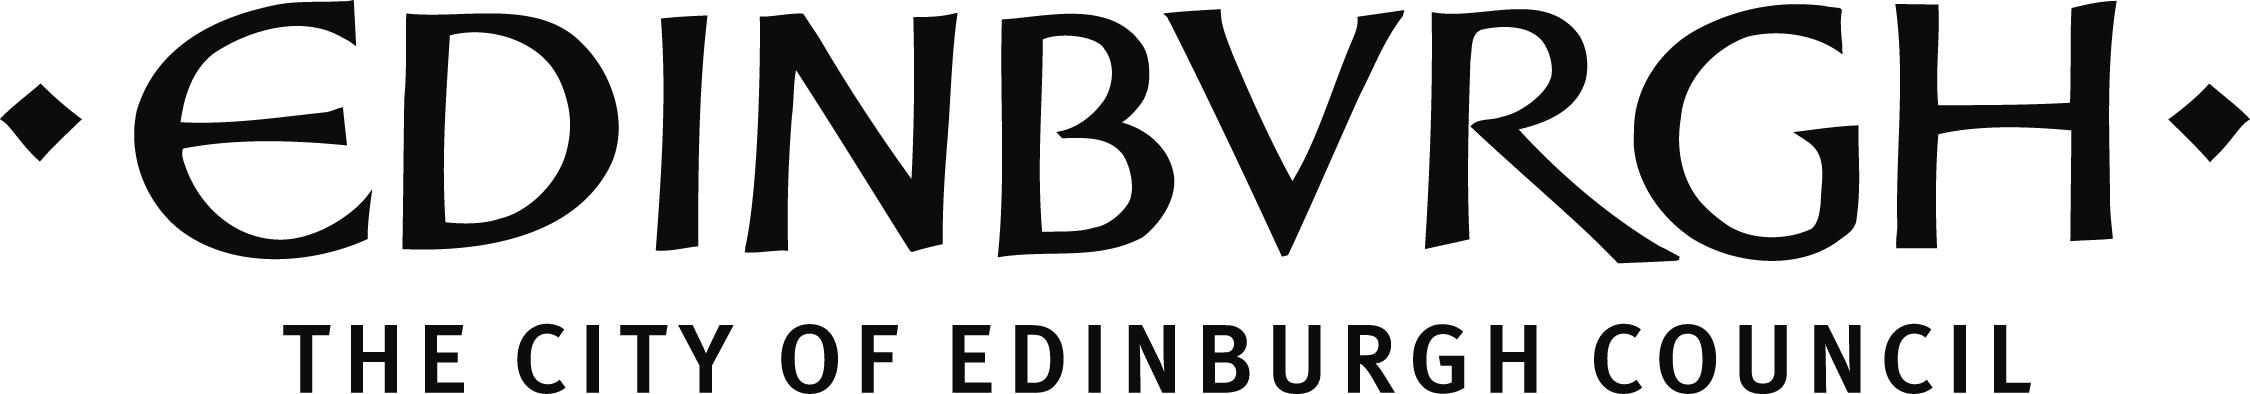 Edinburgh - Scottish News